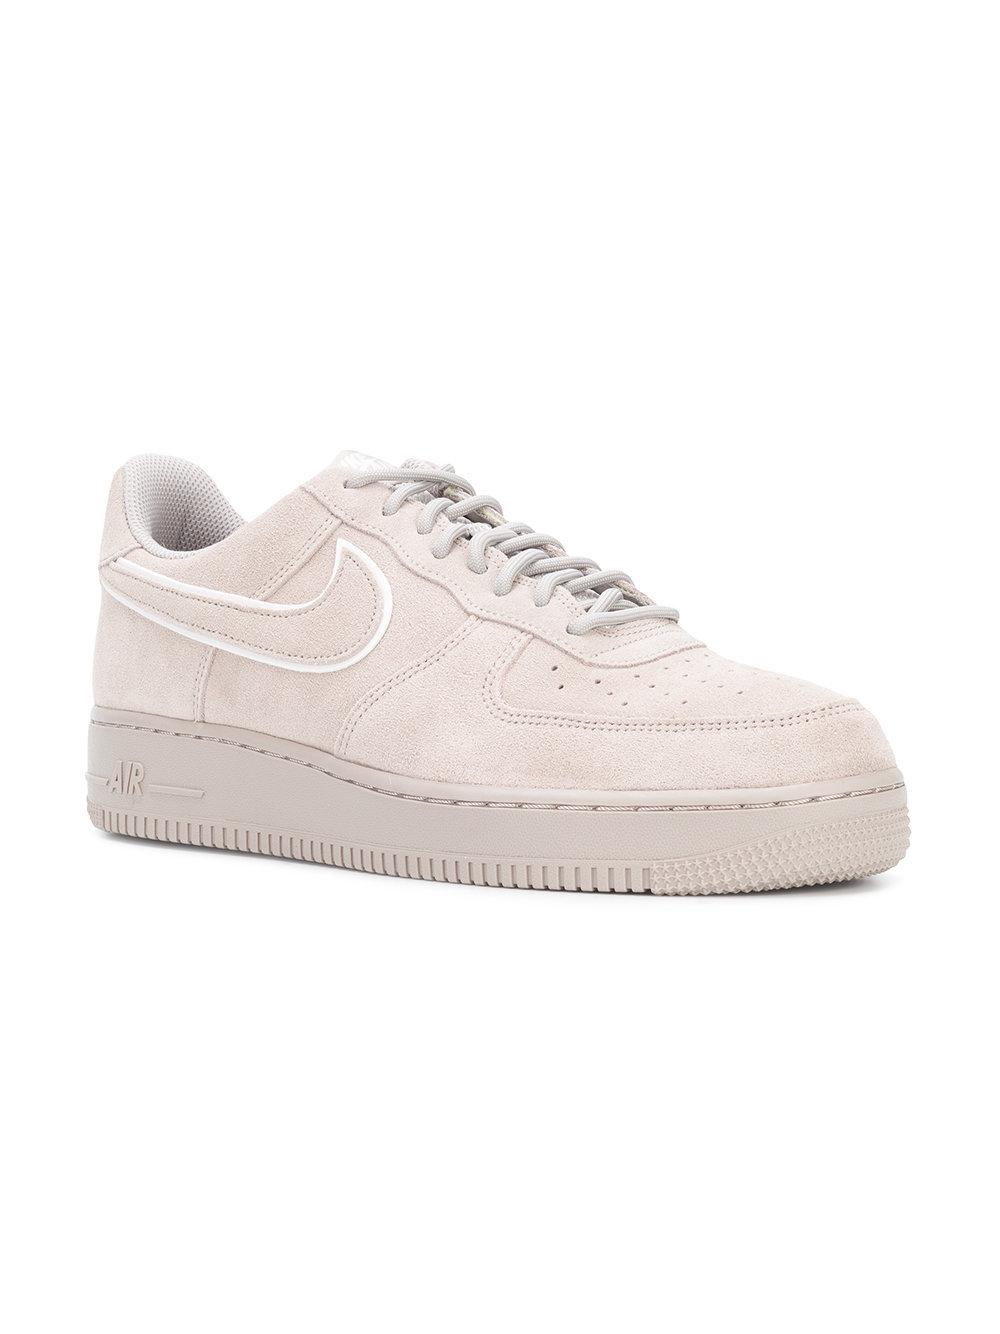 Air Force 1 07 Lv8 Sneakers